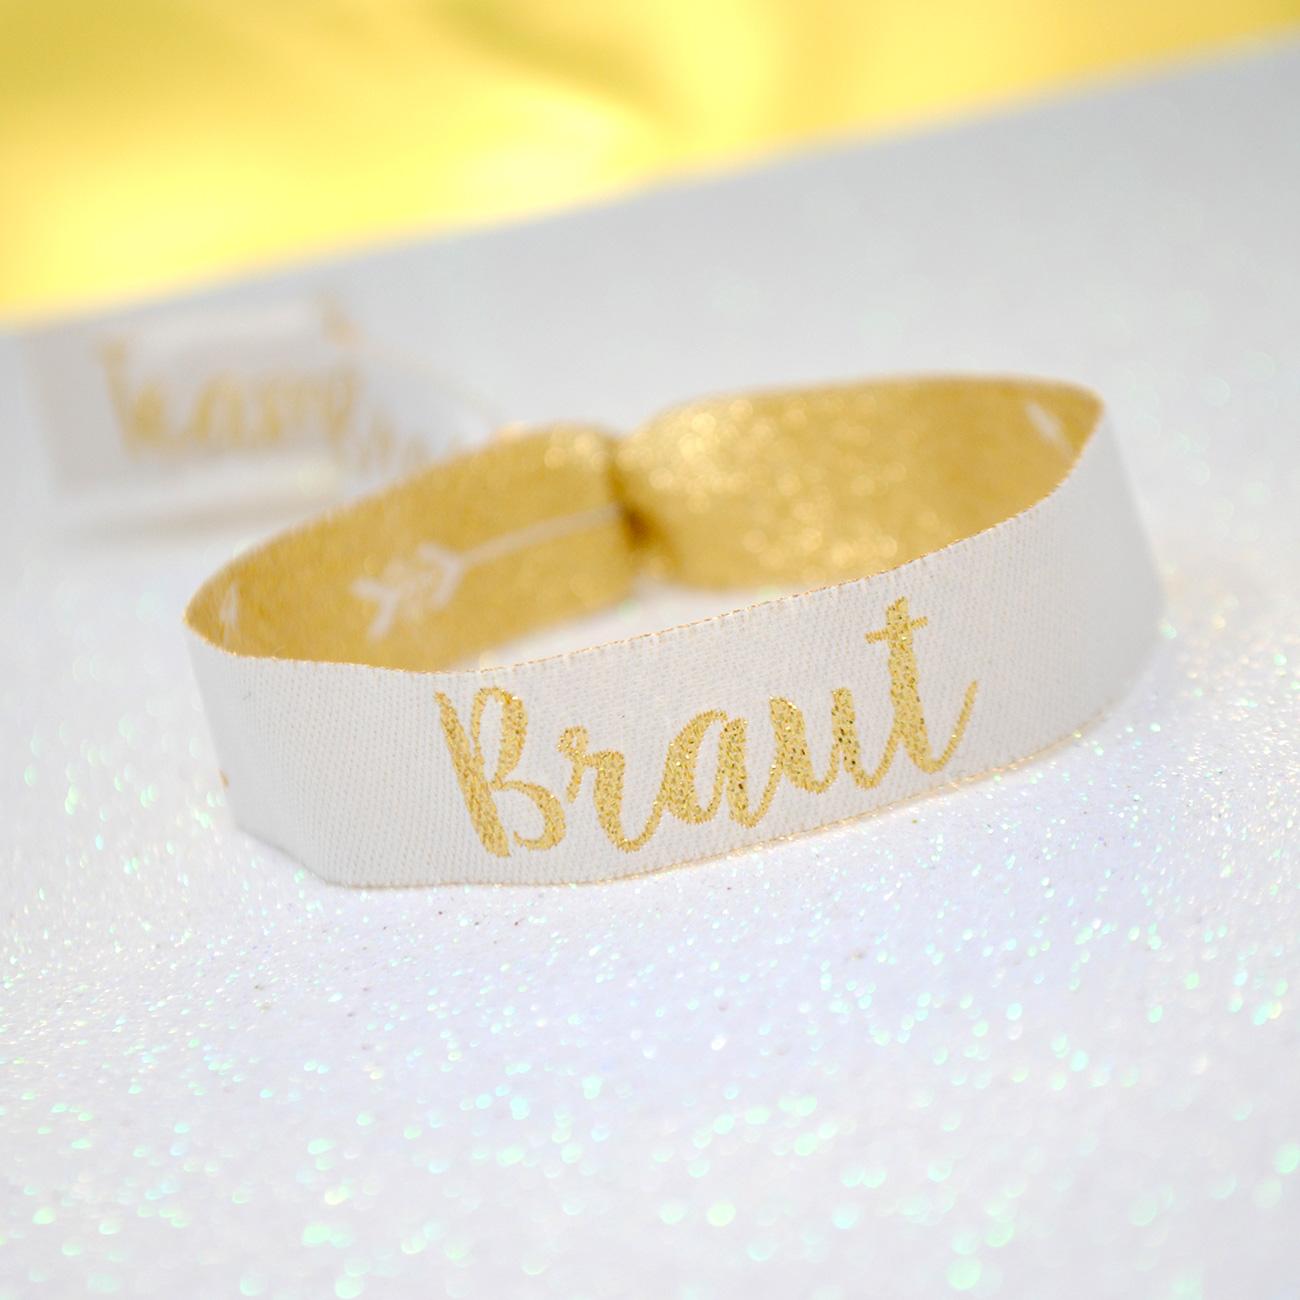 braut bride Junggesellinnenabschied-armband hen party wristband